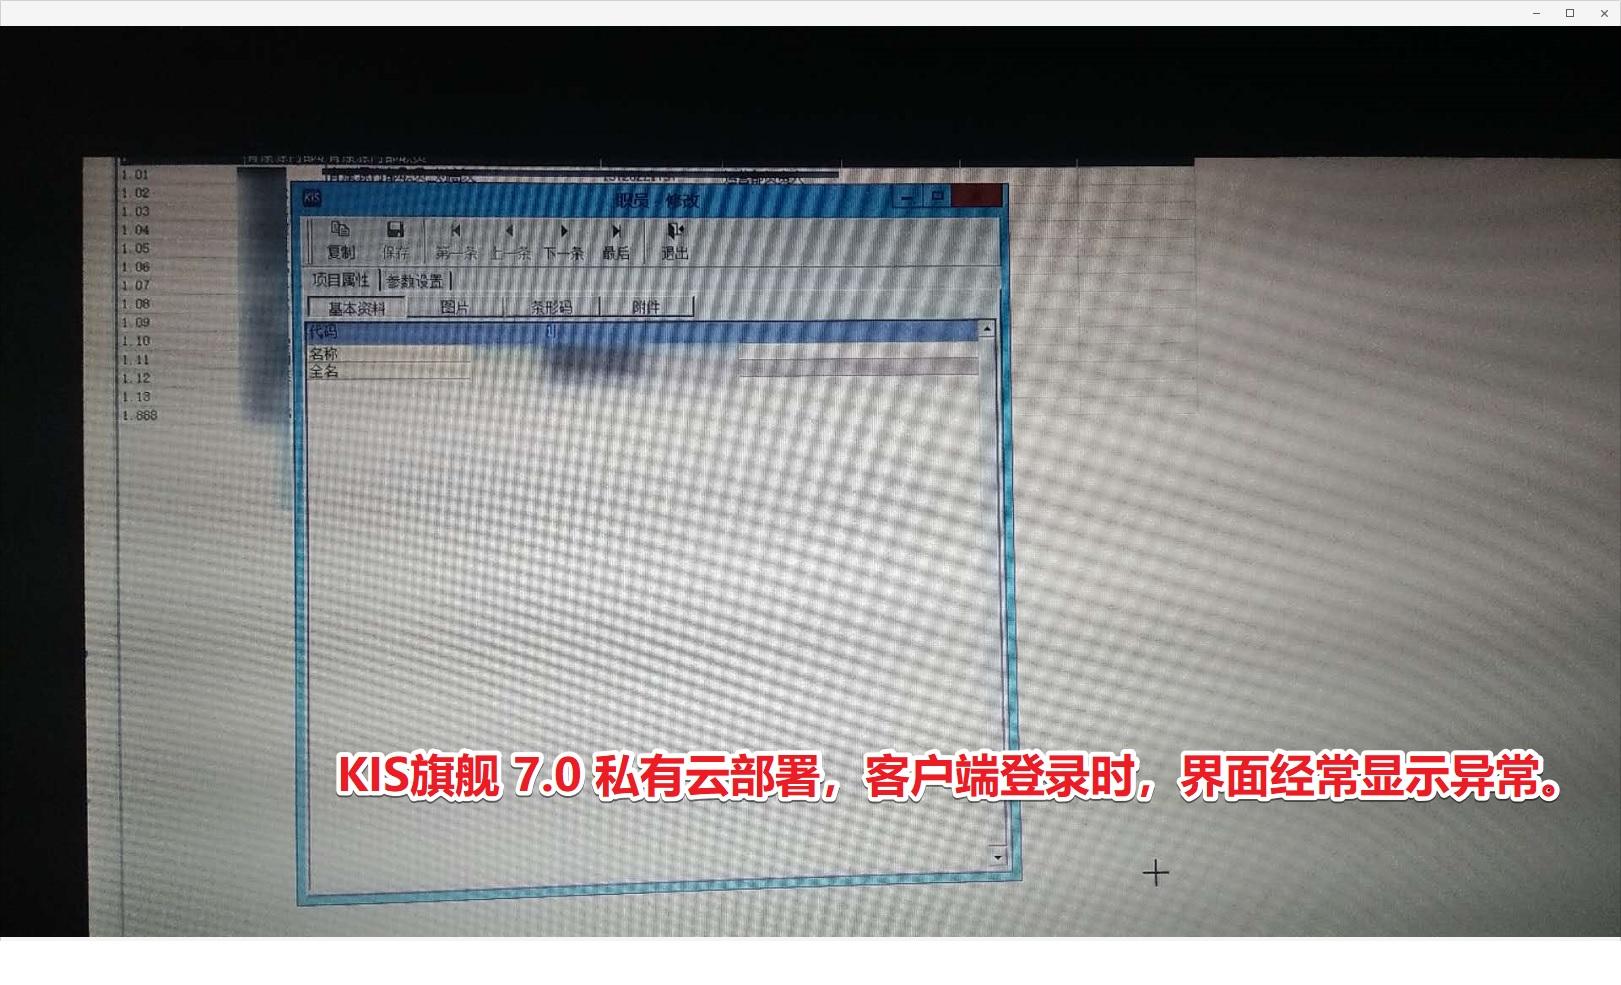 KIS云<a href=